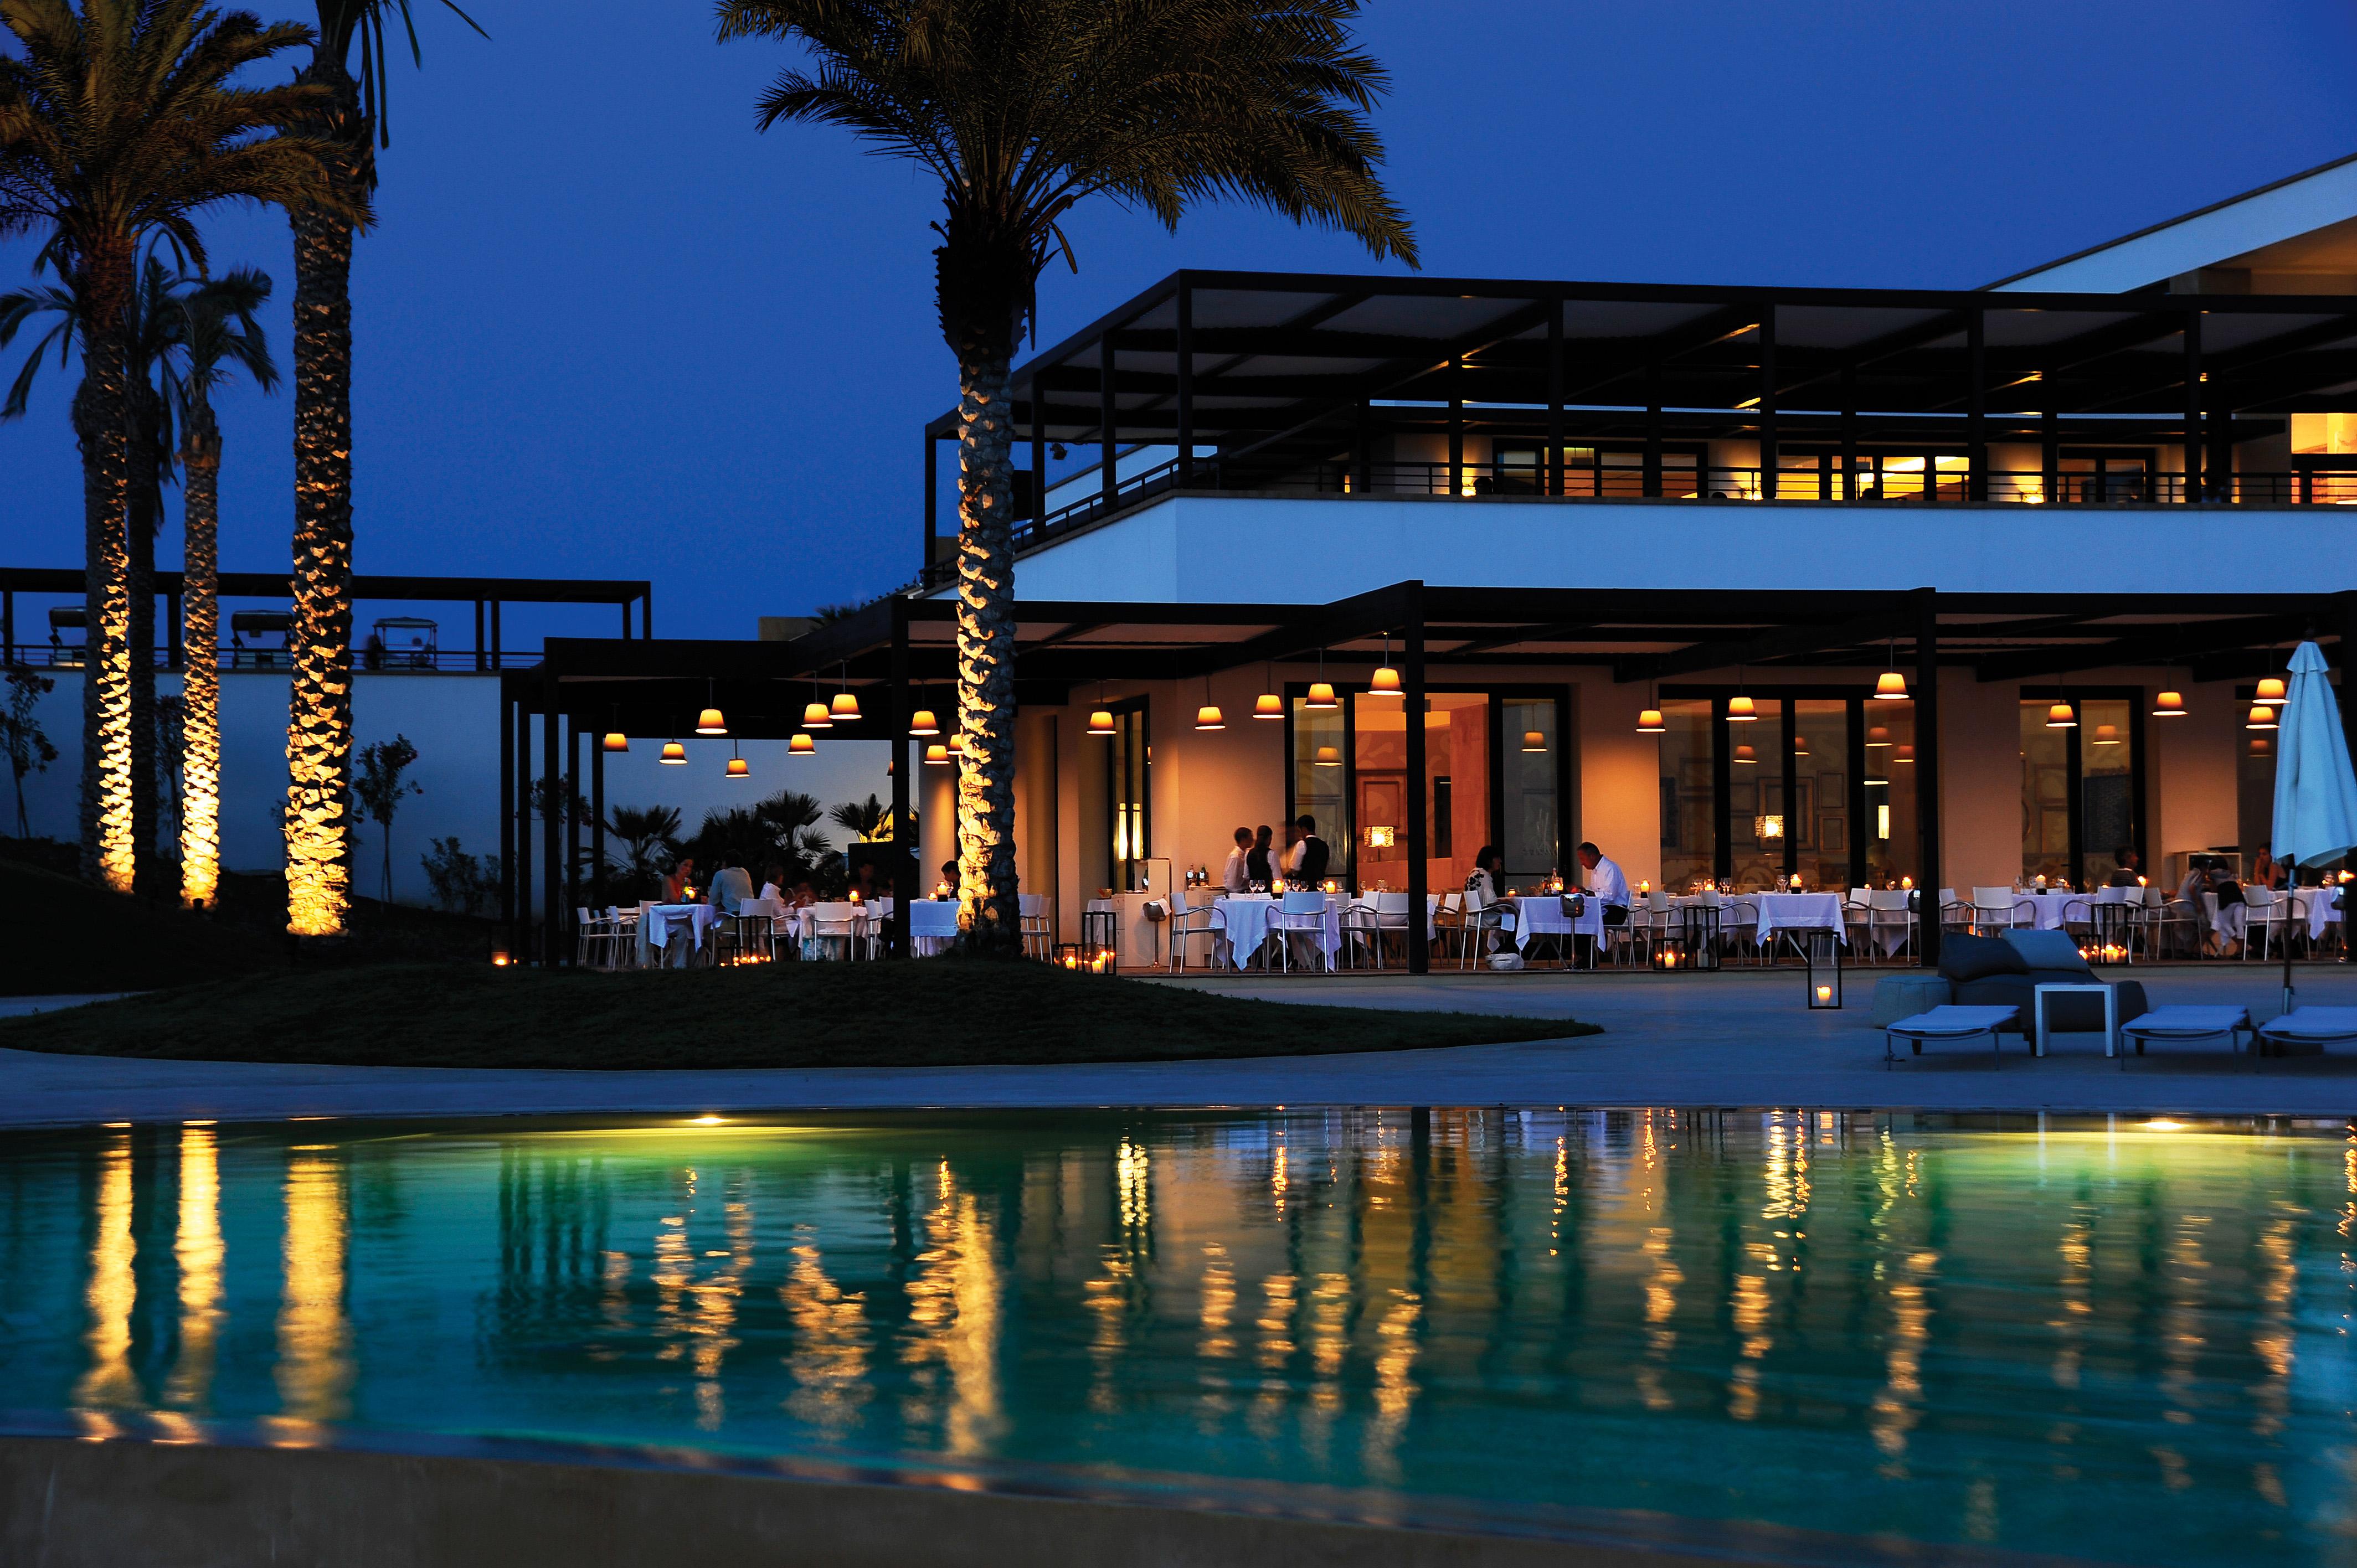 Verdura_Golf_Spa_Resort_La_Zagara